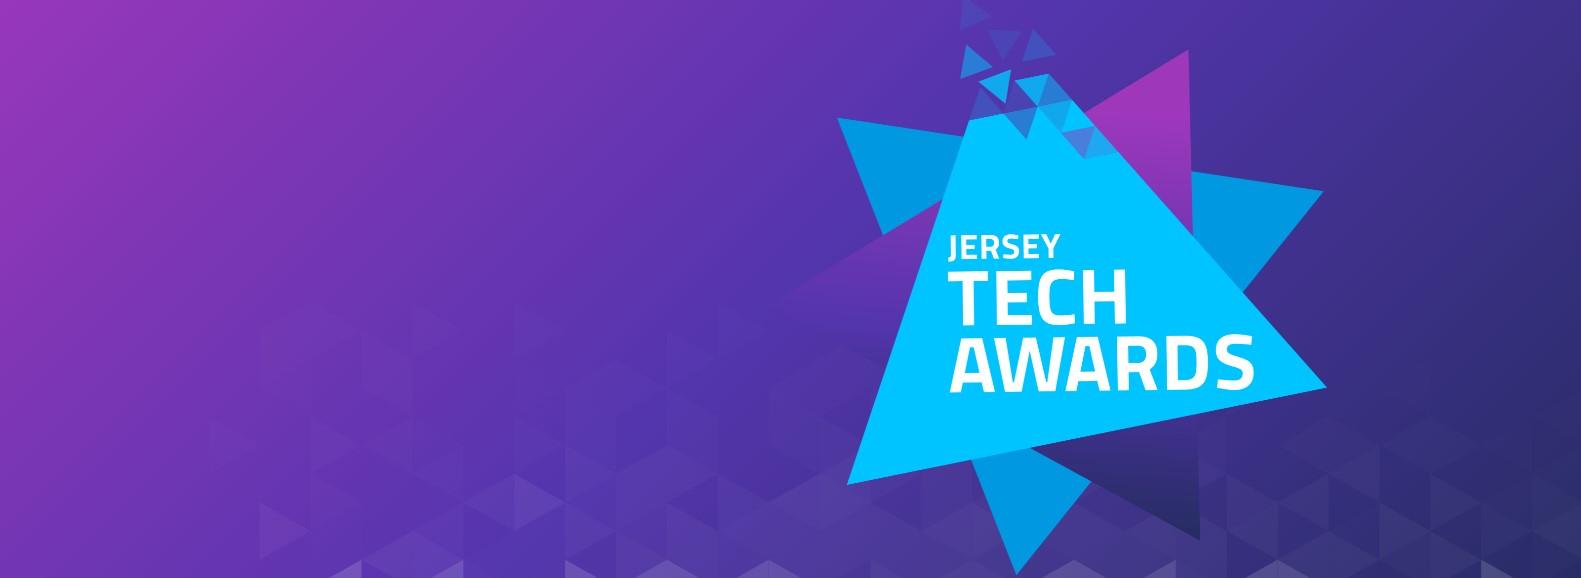 Jersey Tech Awards